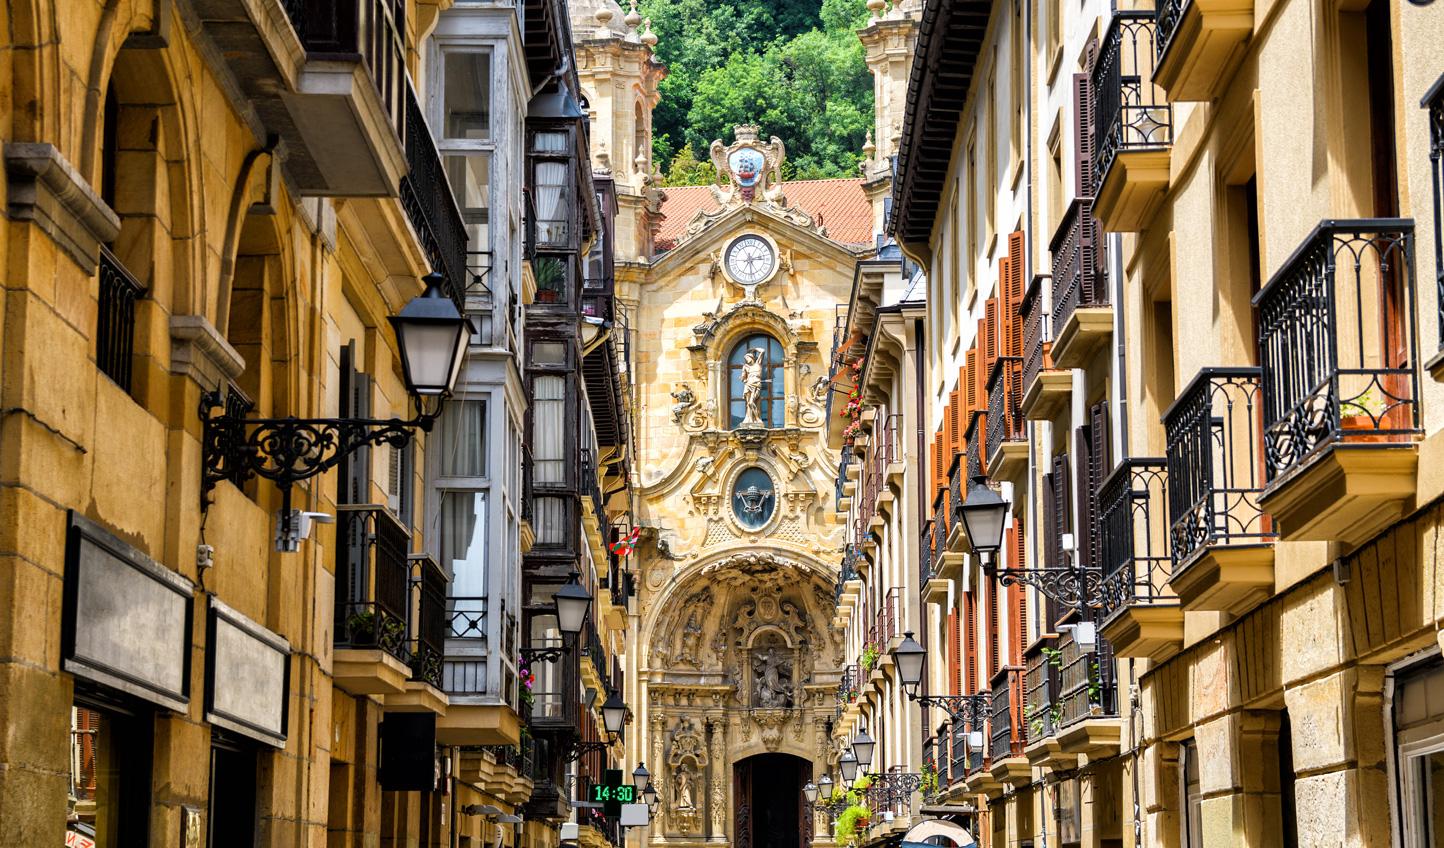 Explore the busy streets of San Sebastian